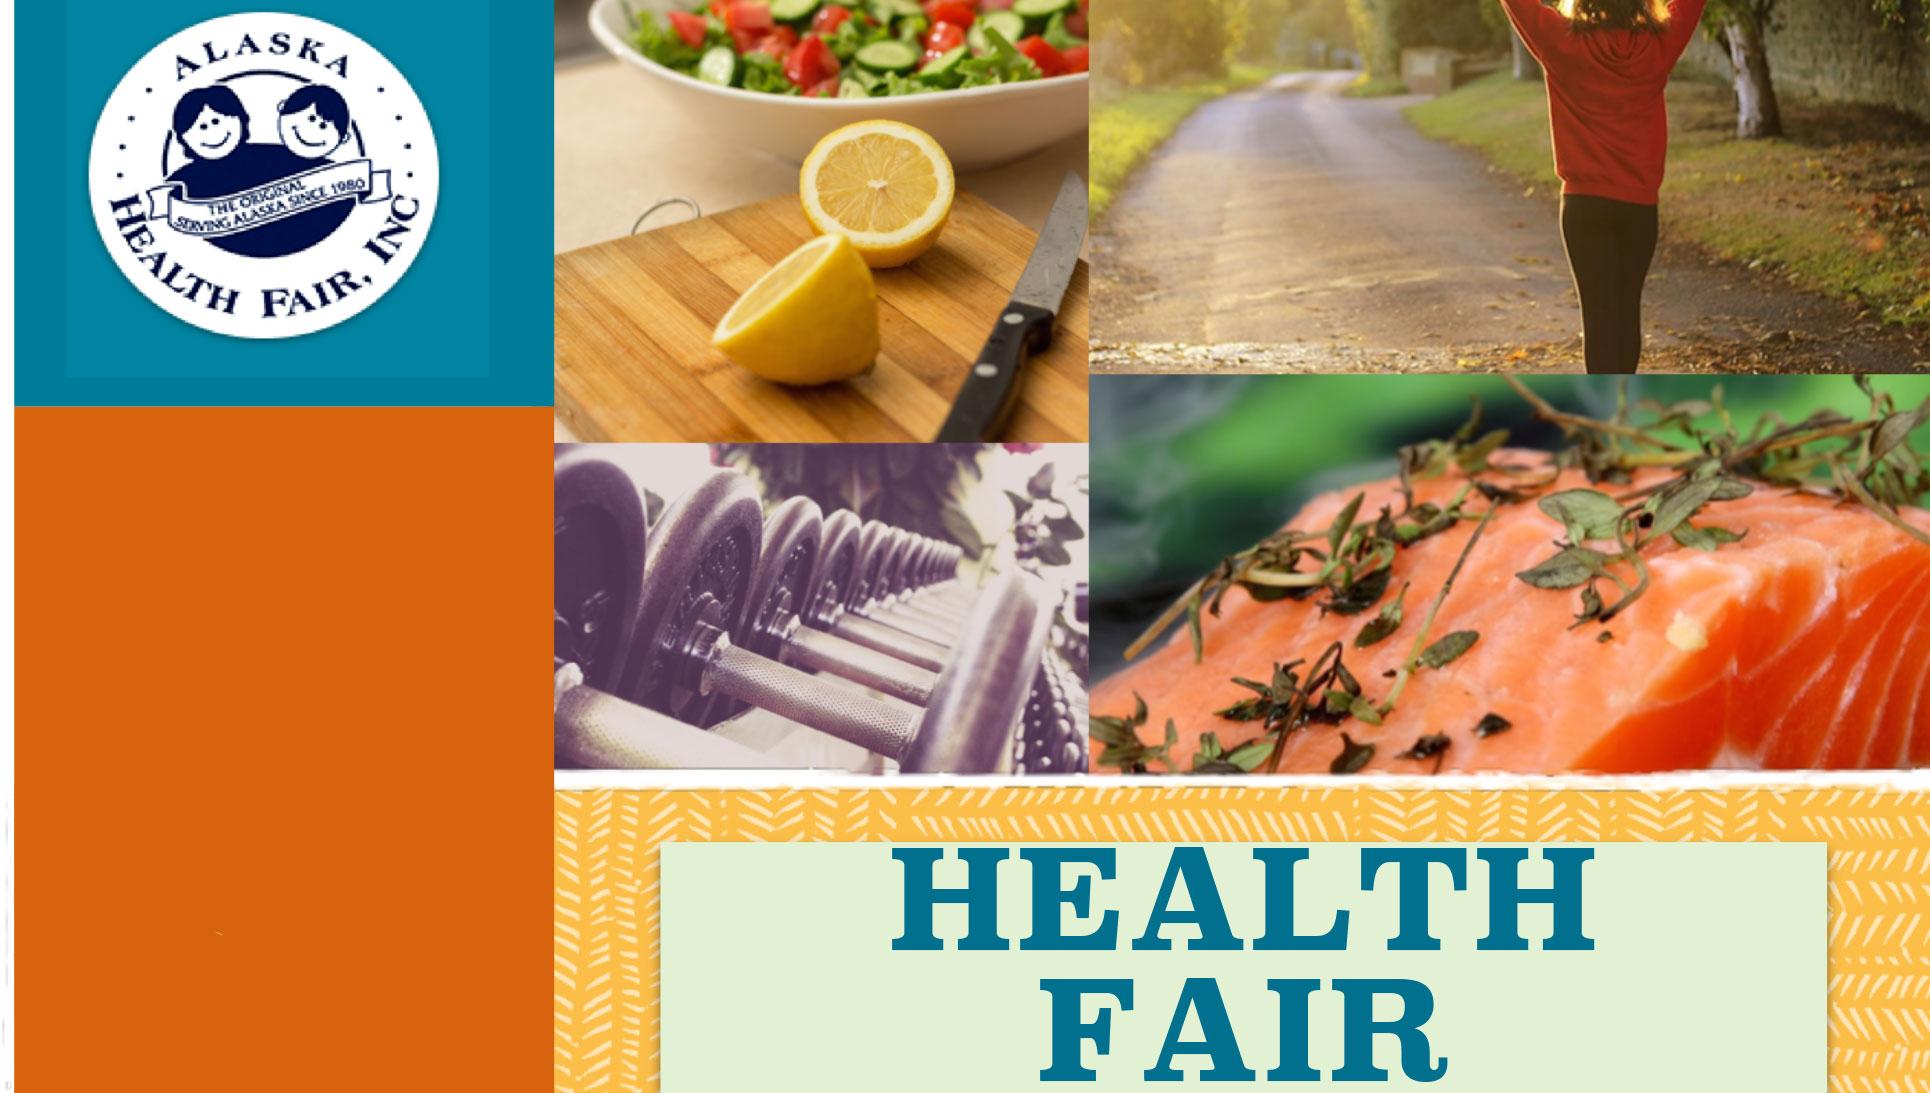 Alaska Health Fair, Quality blood tests at affordable prices | Alaska